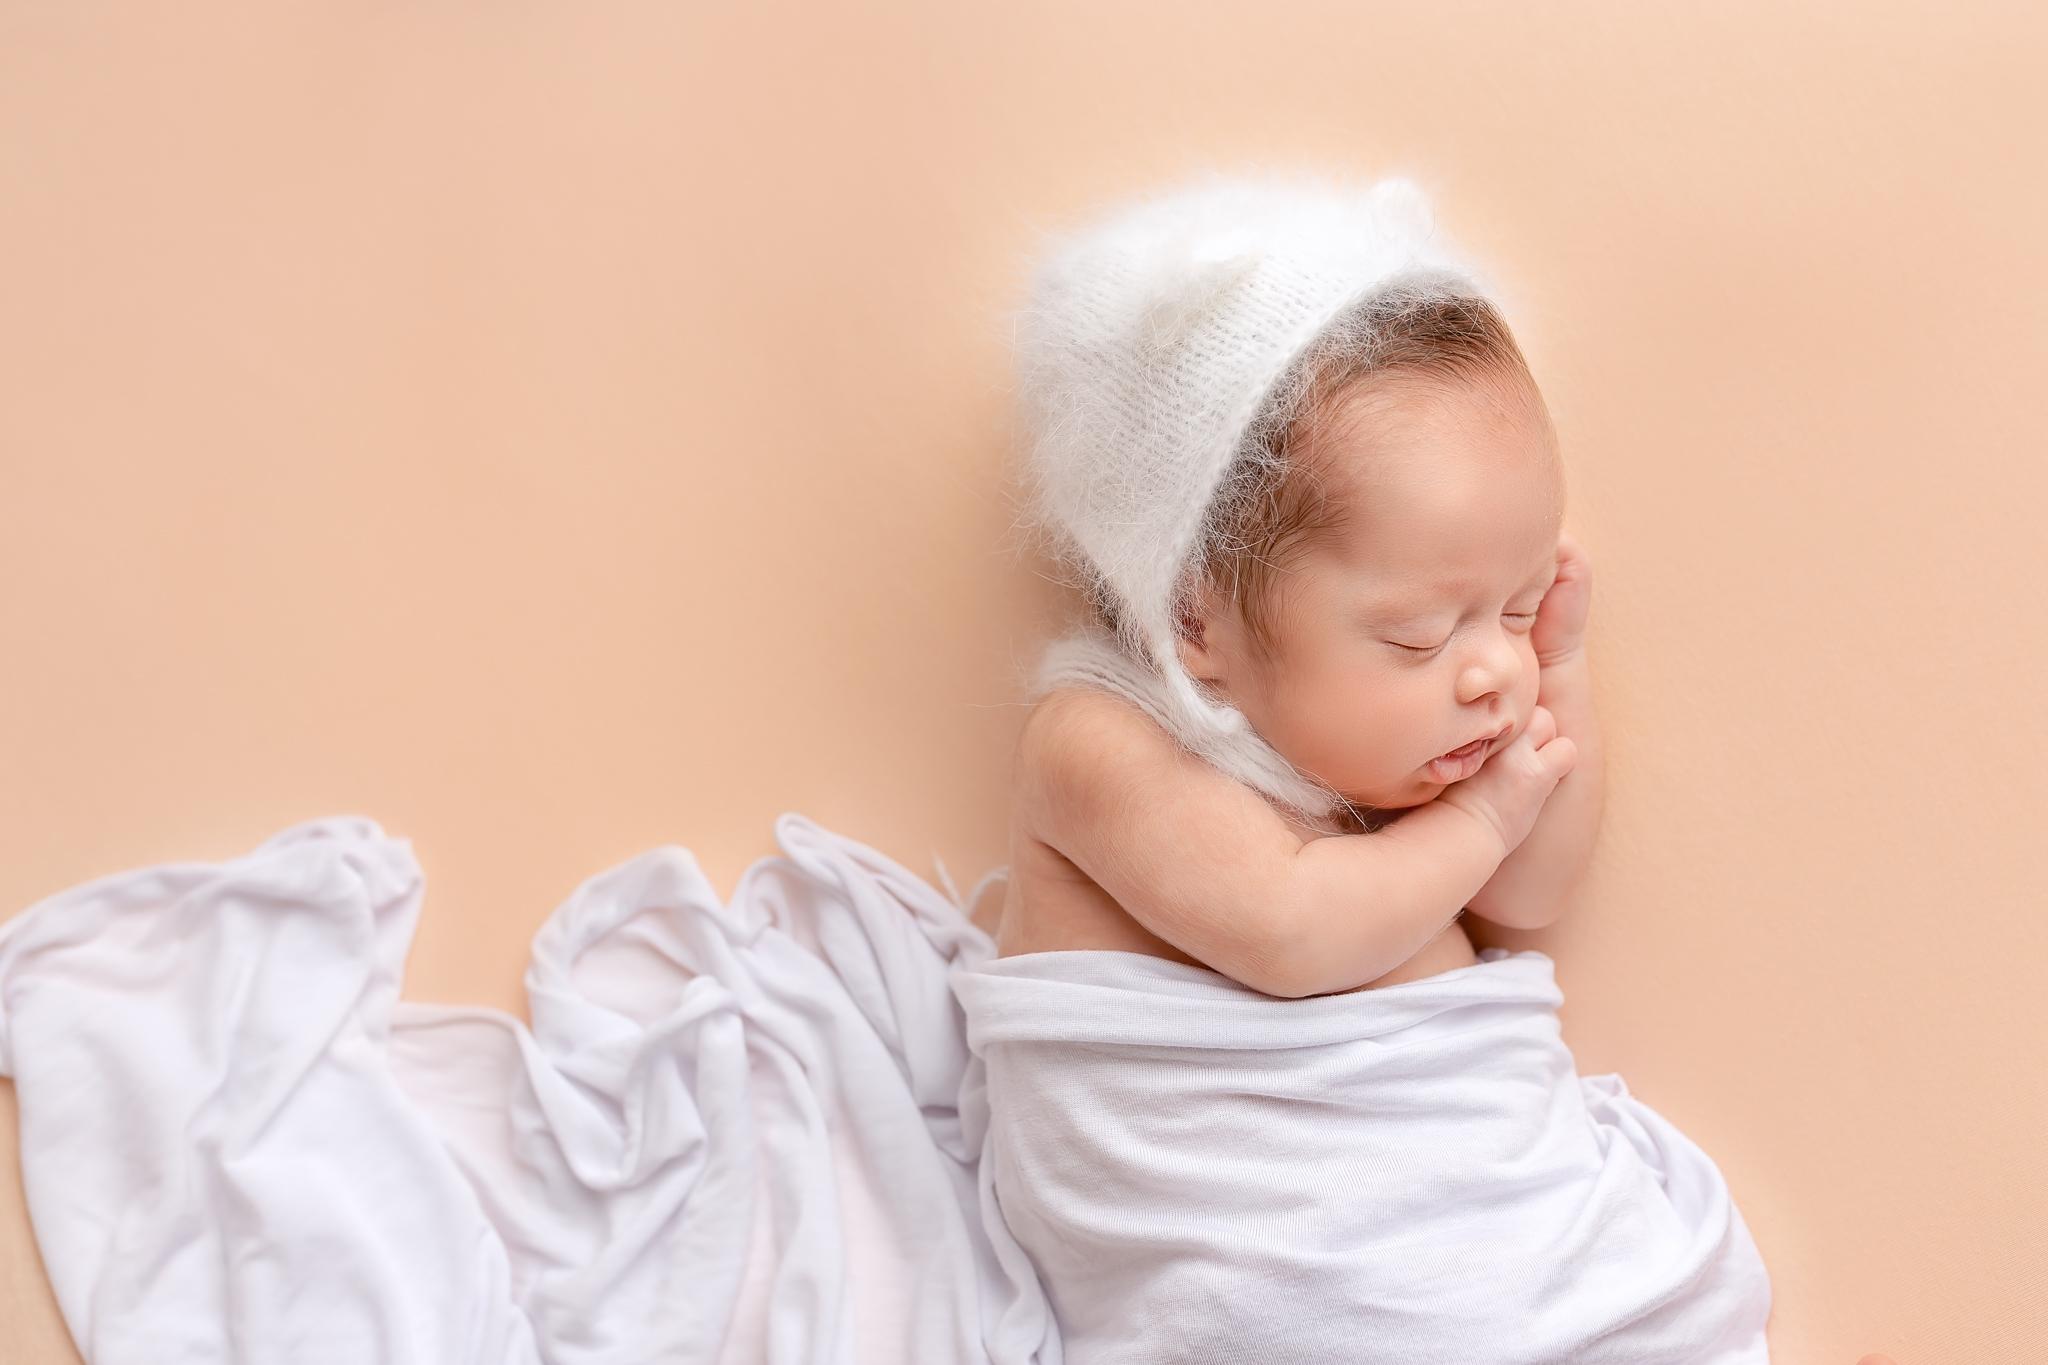 Professional newborn photography Leeds-York-Bradford-Harrogate-Wakefield: newborn baby girl sleeping on a peach blanket during her newborn photoshoot in Leeds, Yorkshire